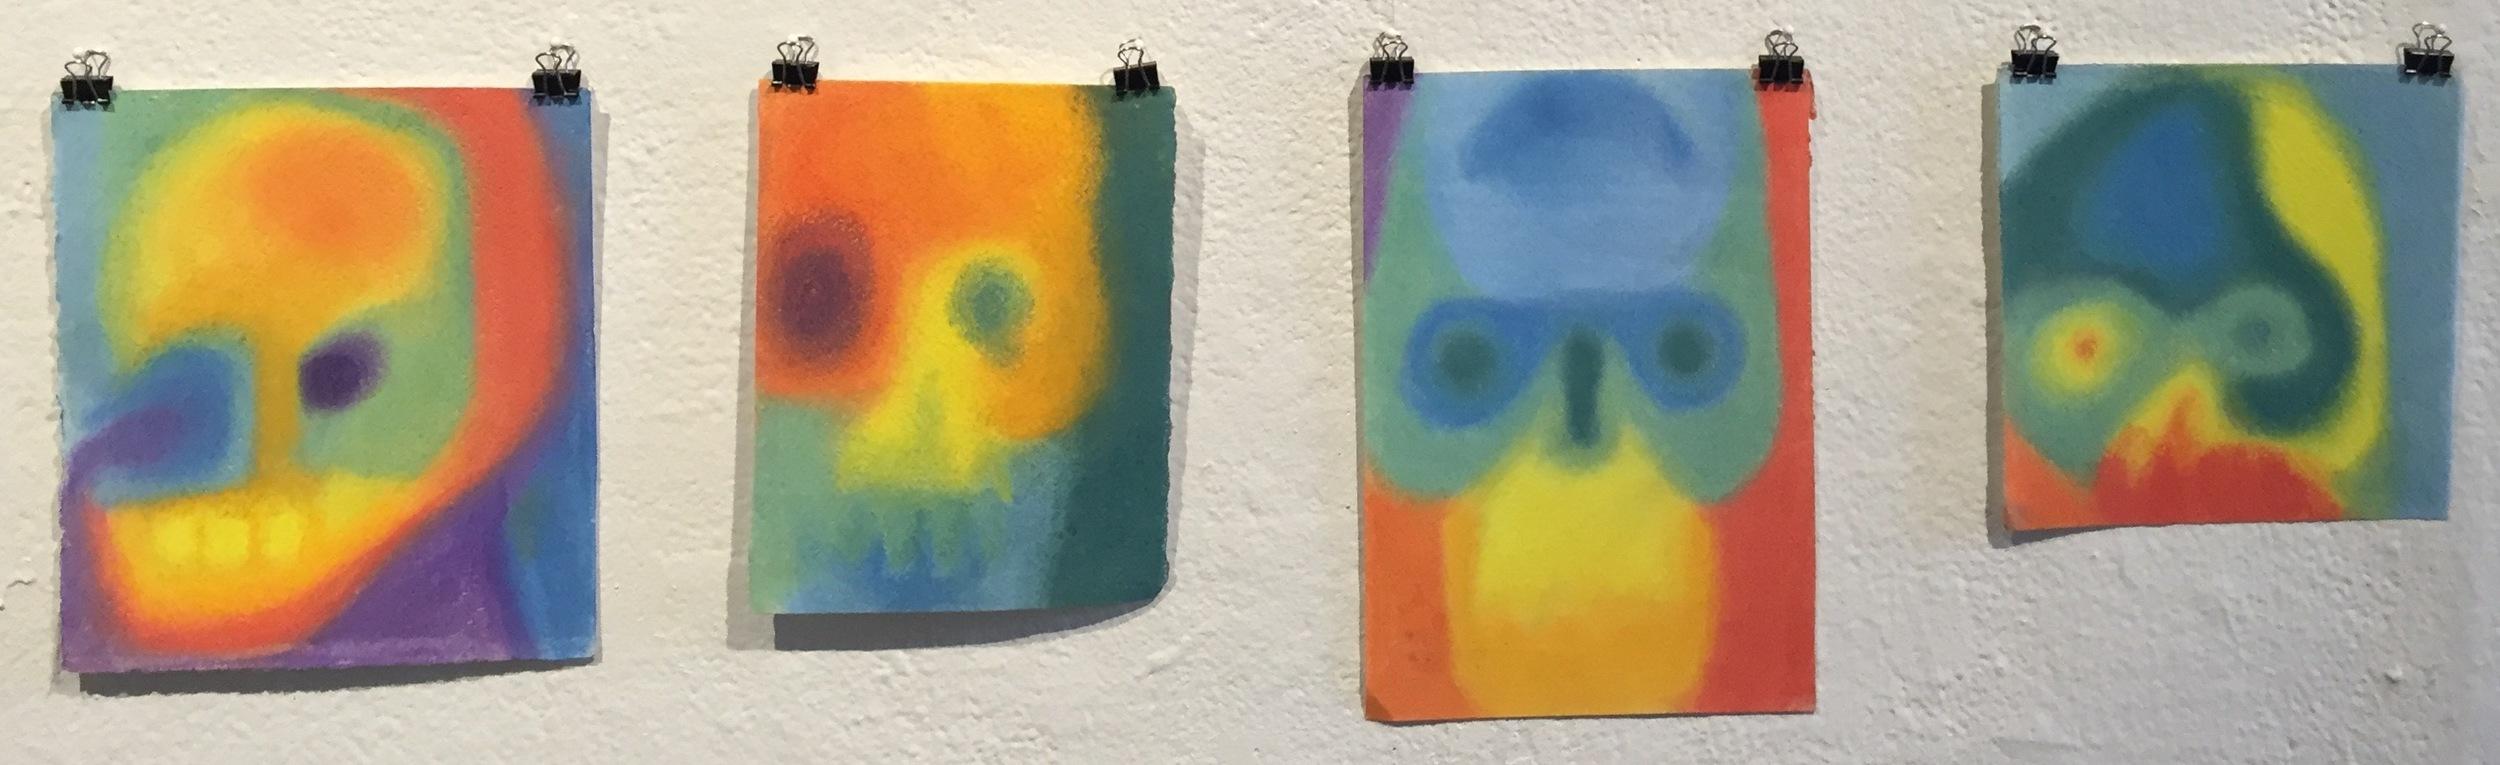 CONSTANZA VALENZUELA   Untitled    chalk pastel on watercolor paper